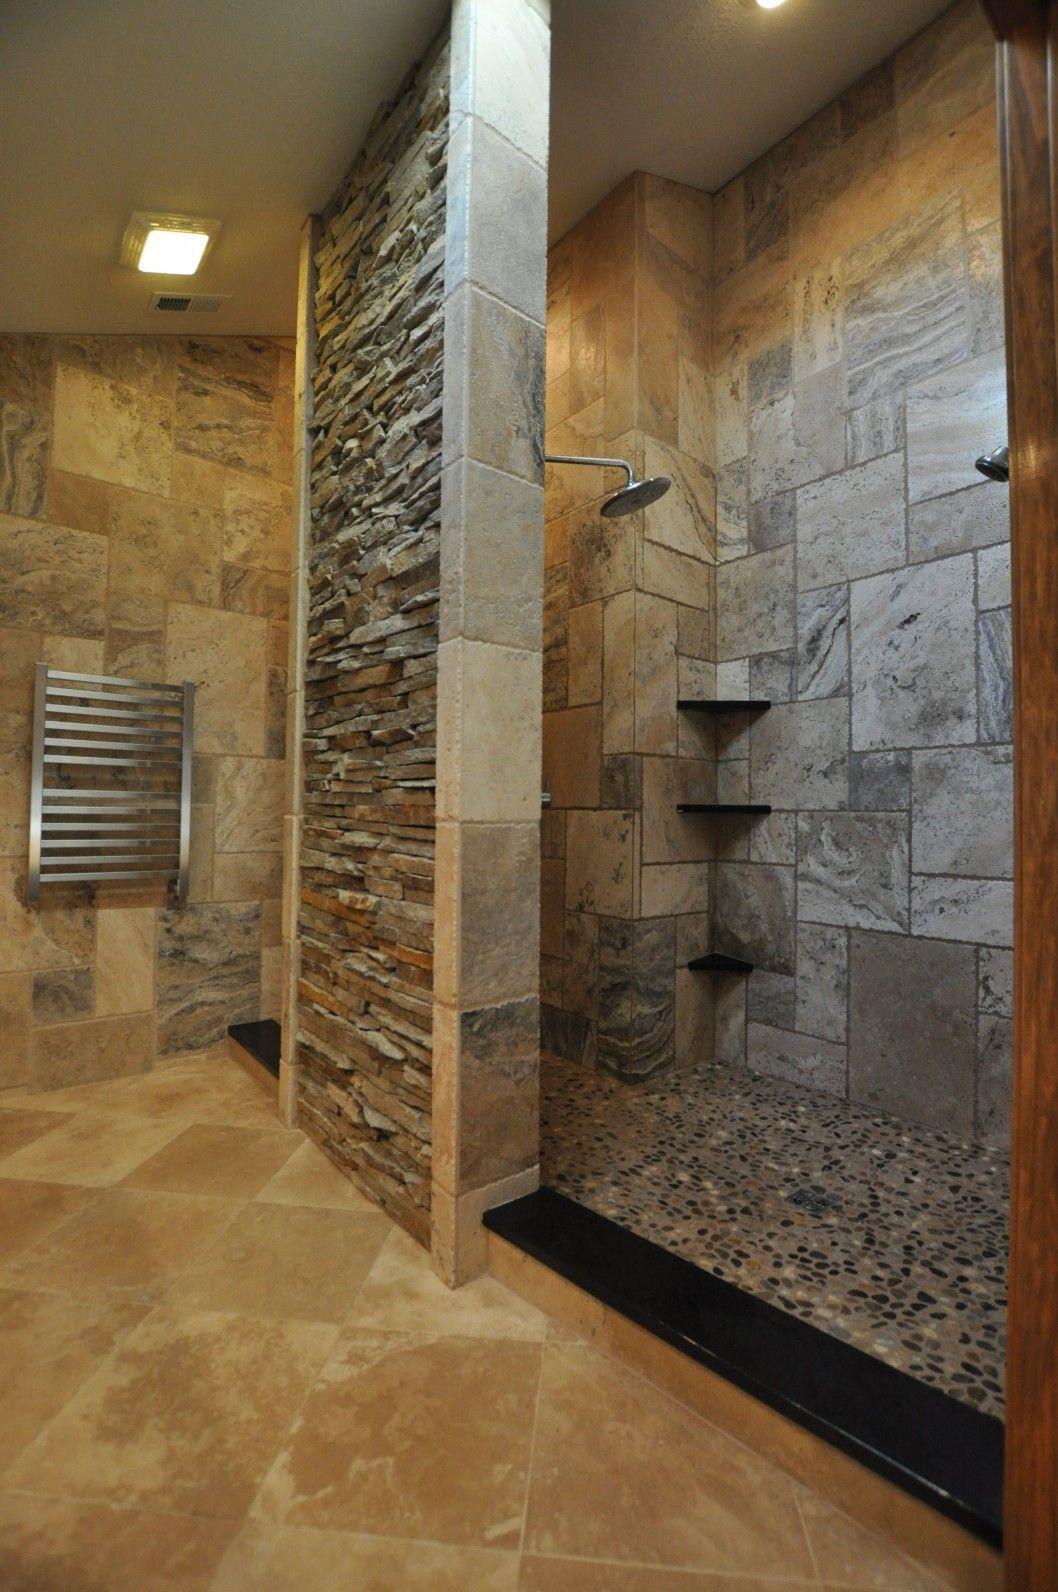 Bathroom exotic bathroom shower in small bathrooms designs with